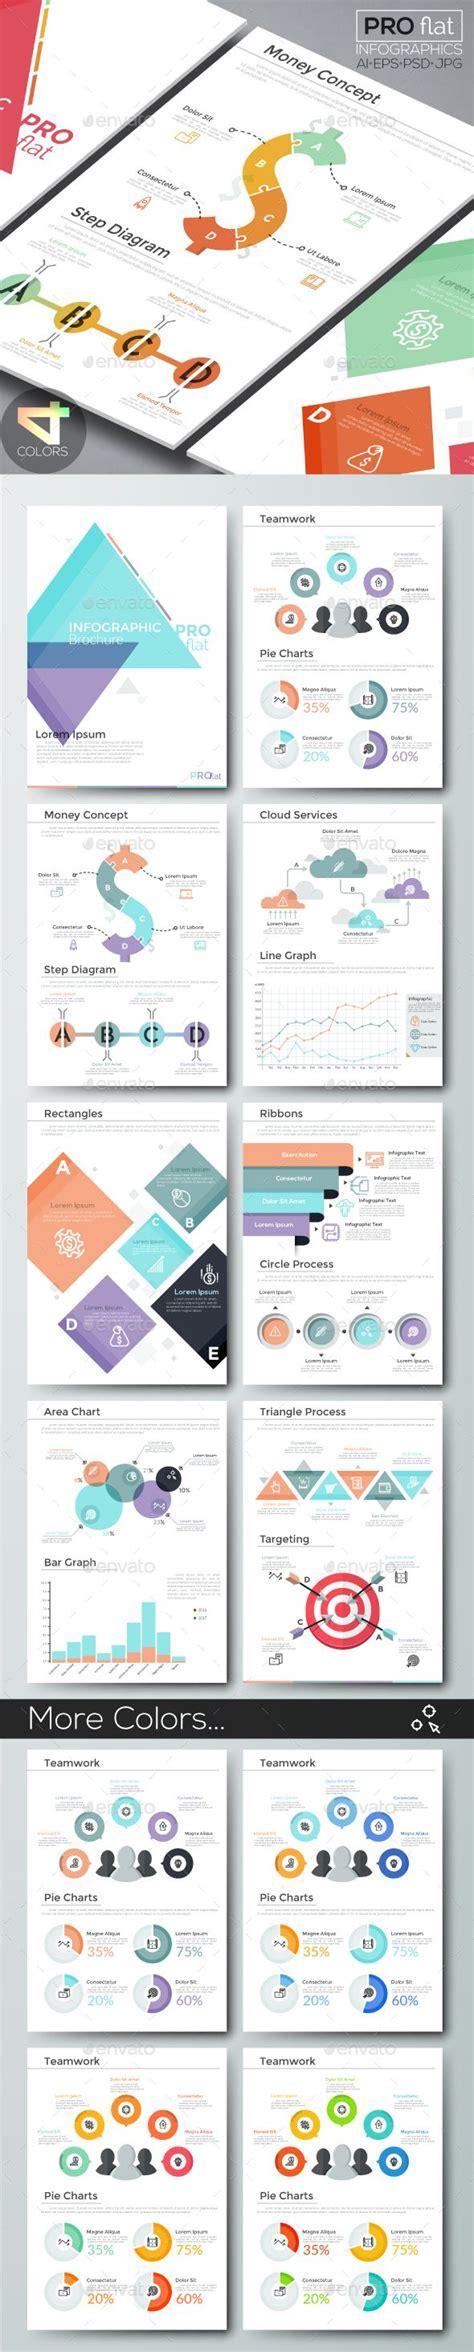 infographic templates for adobe illustrator 2273 best images about best infographic templates on